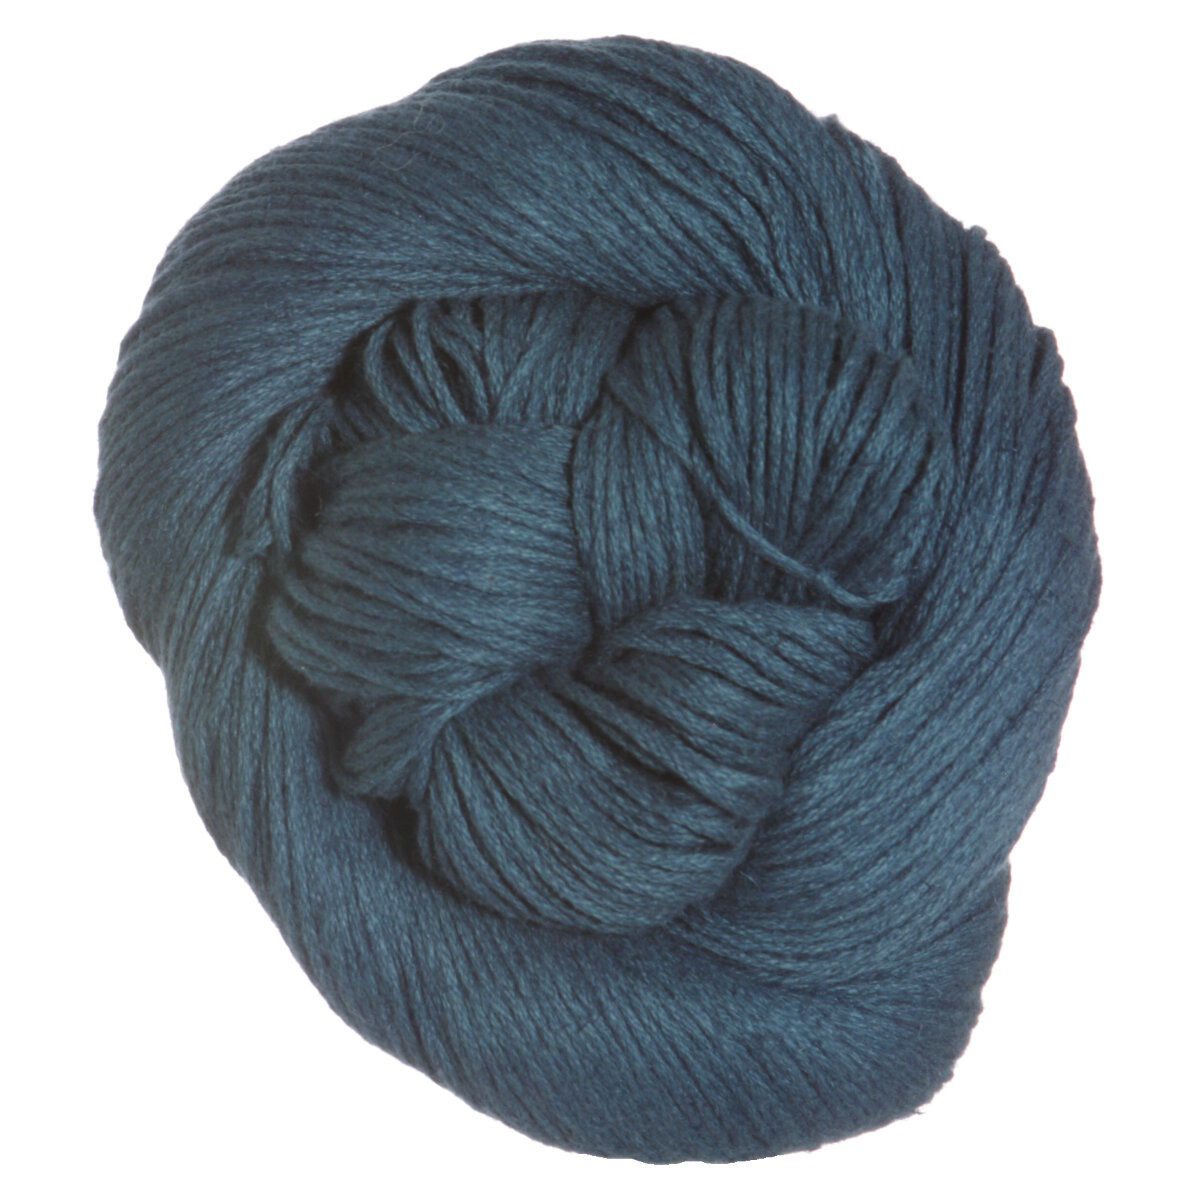 Rowan Creative Linen Yarn 636 Darkness Discontinued At